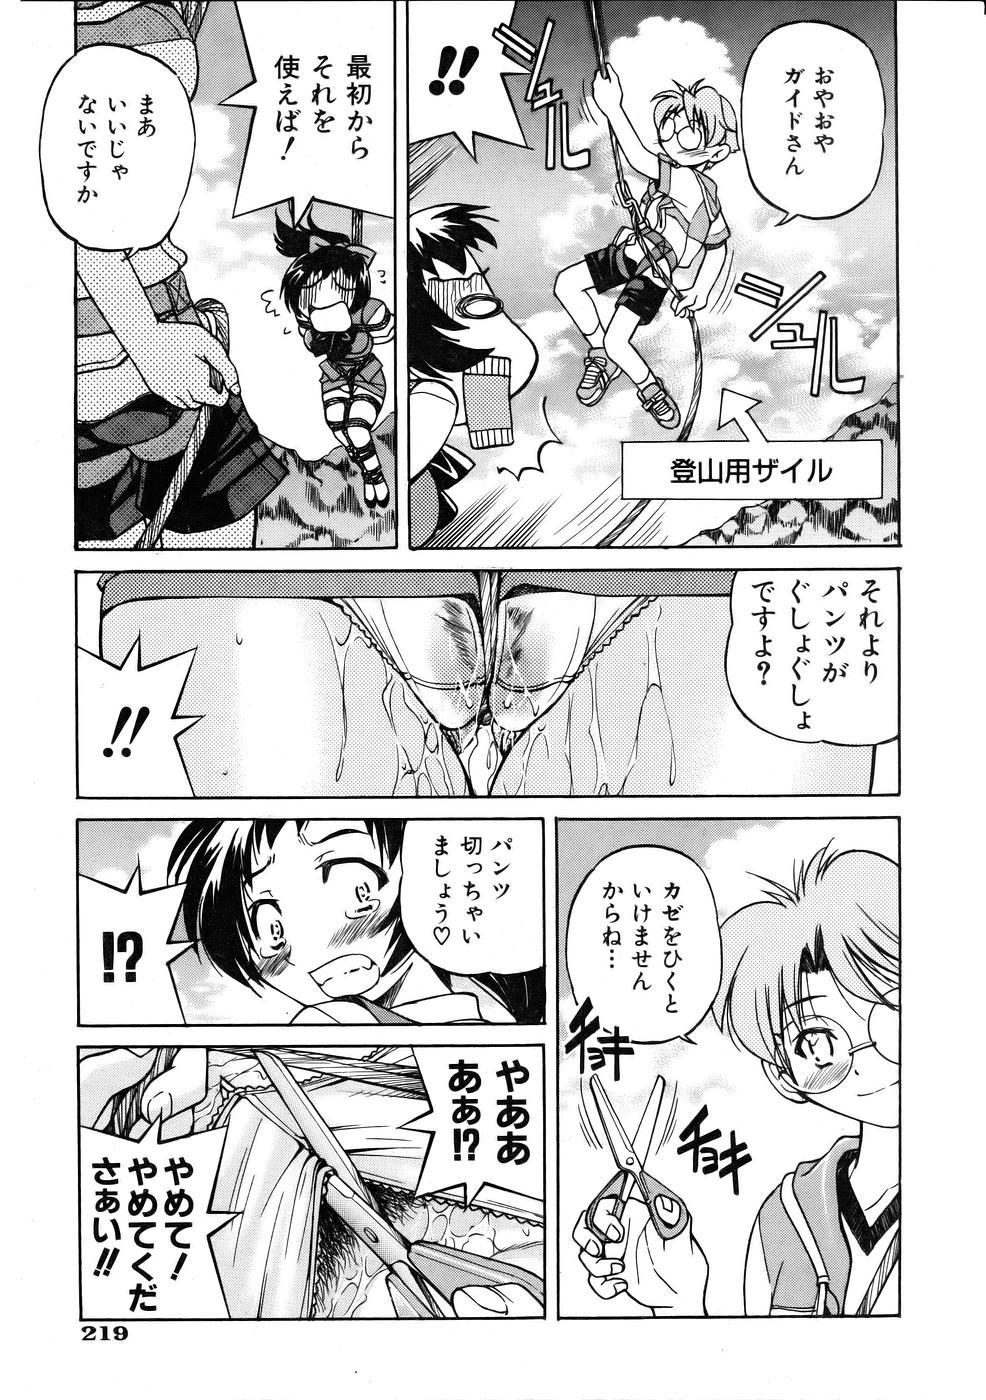 COMIC AUN 2005-10 Vol. 113 218